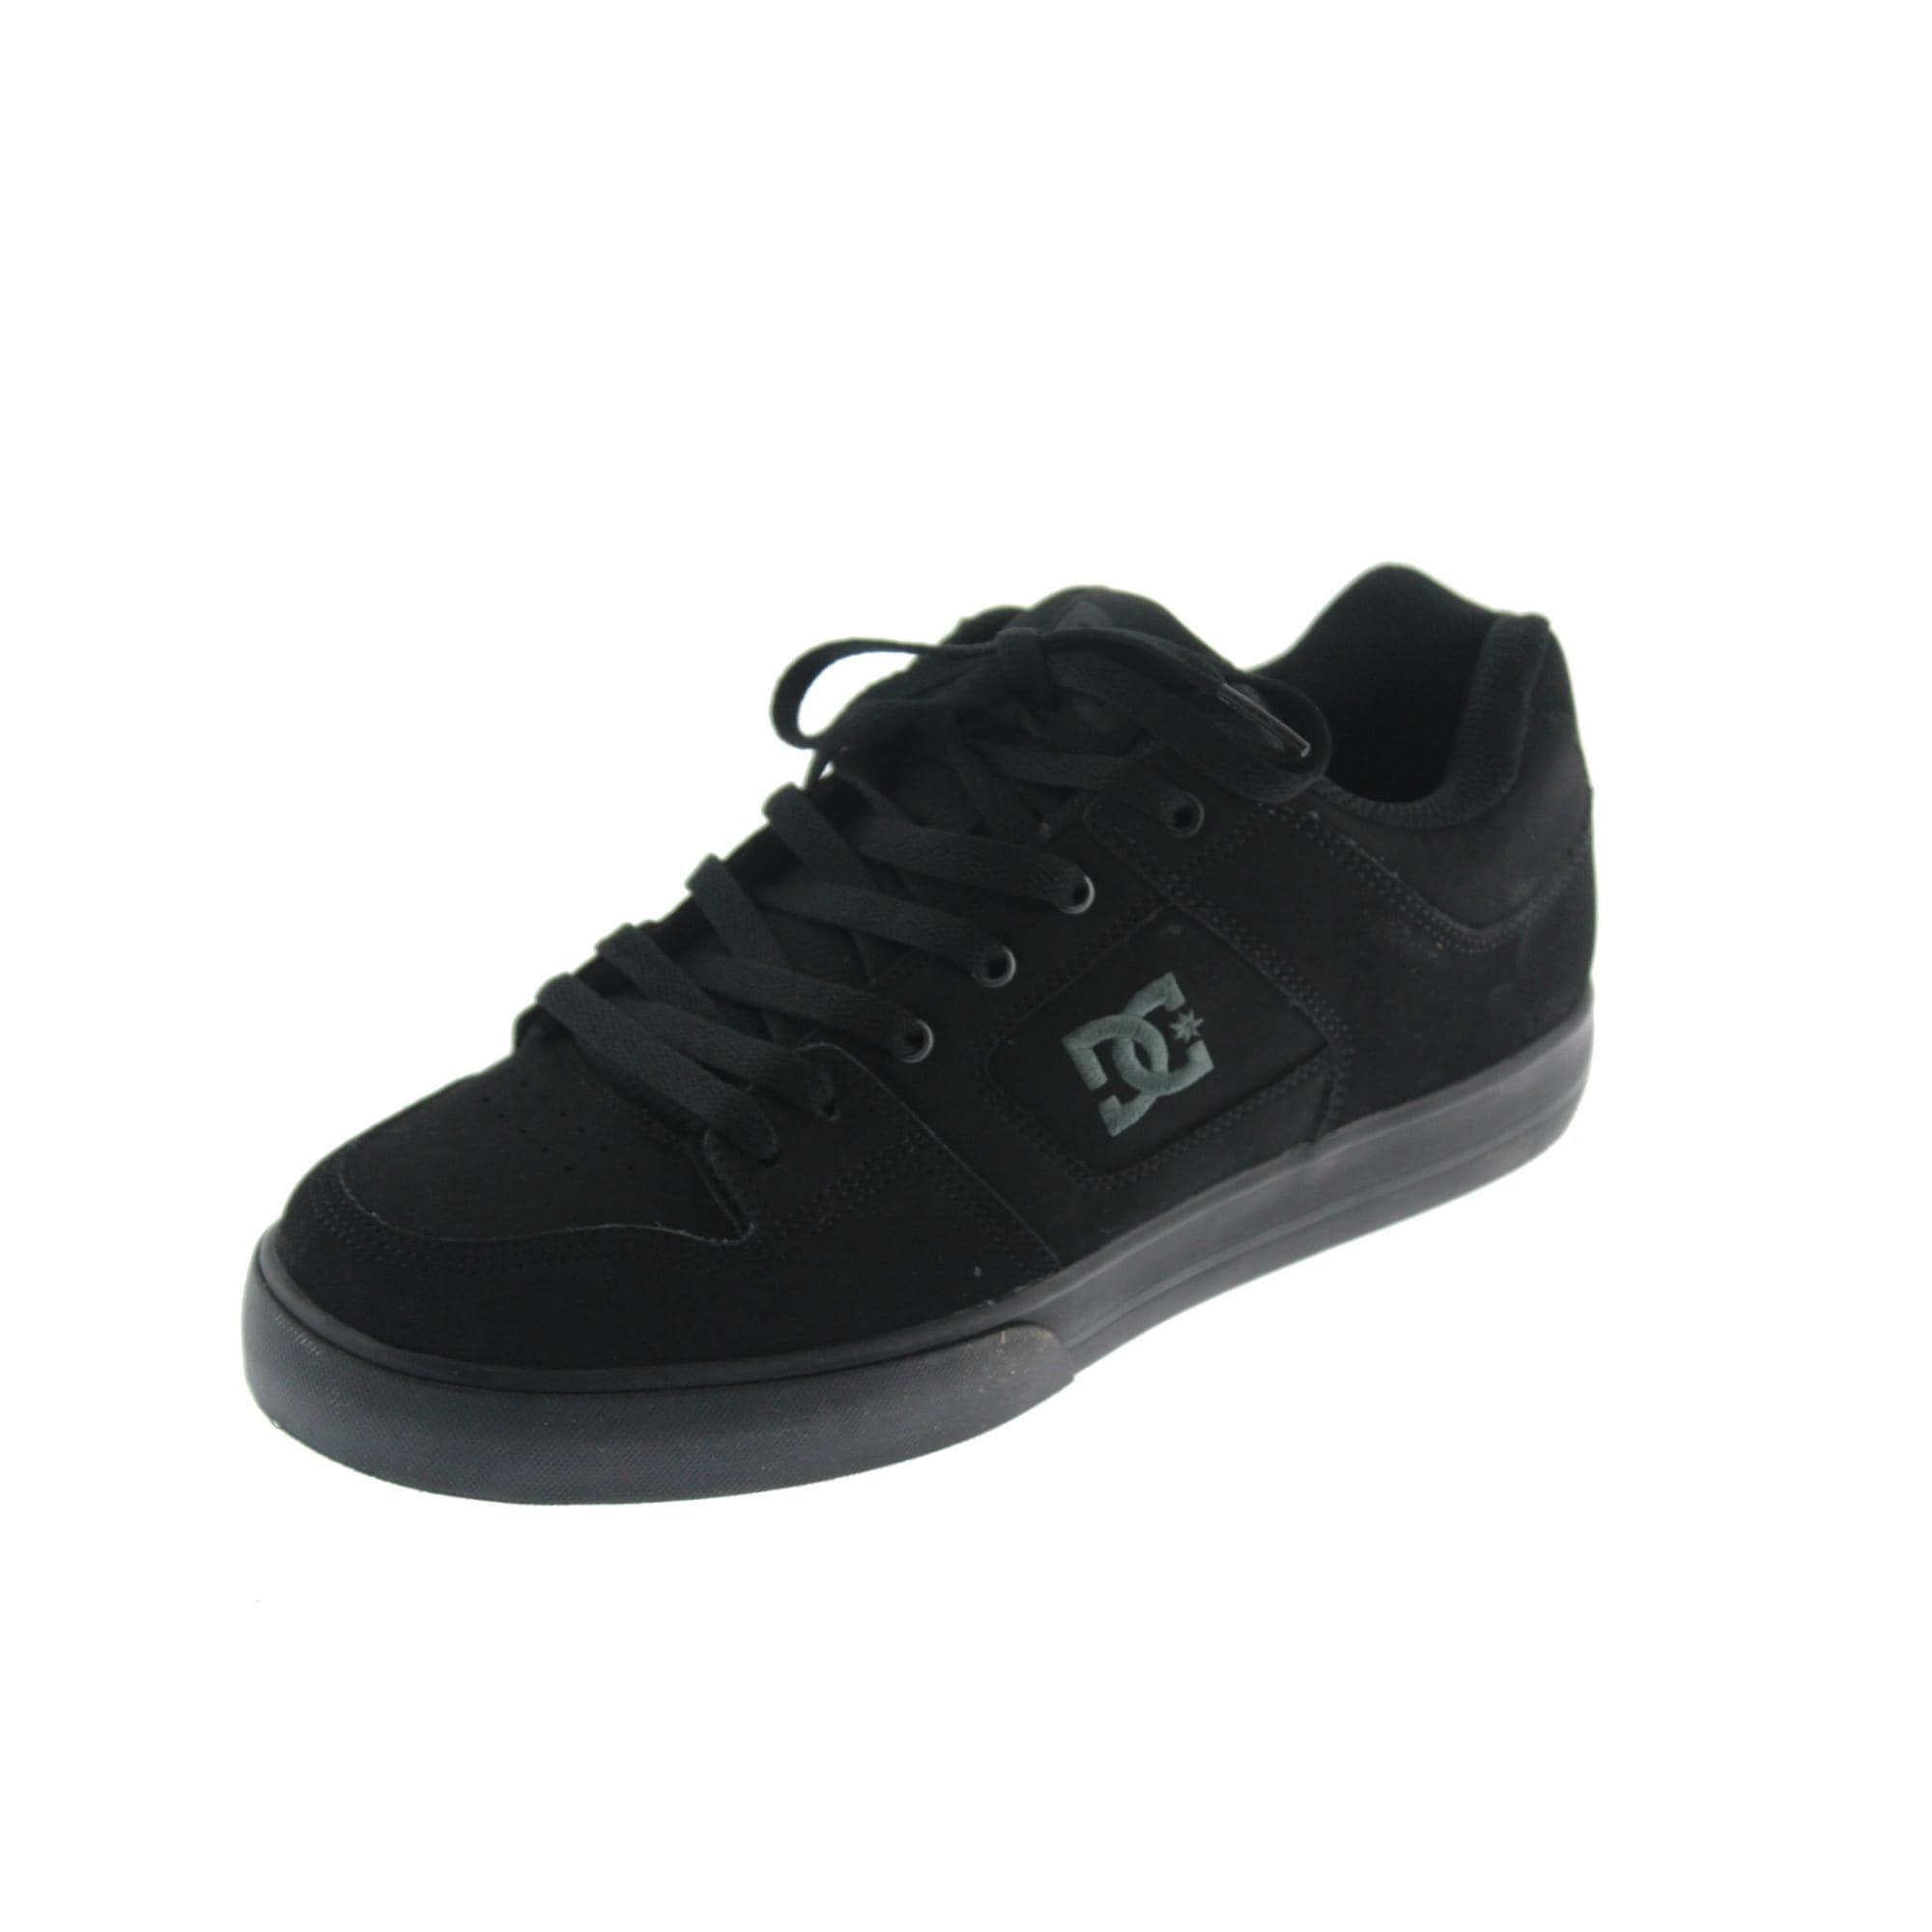 dc skate shoes near me